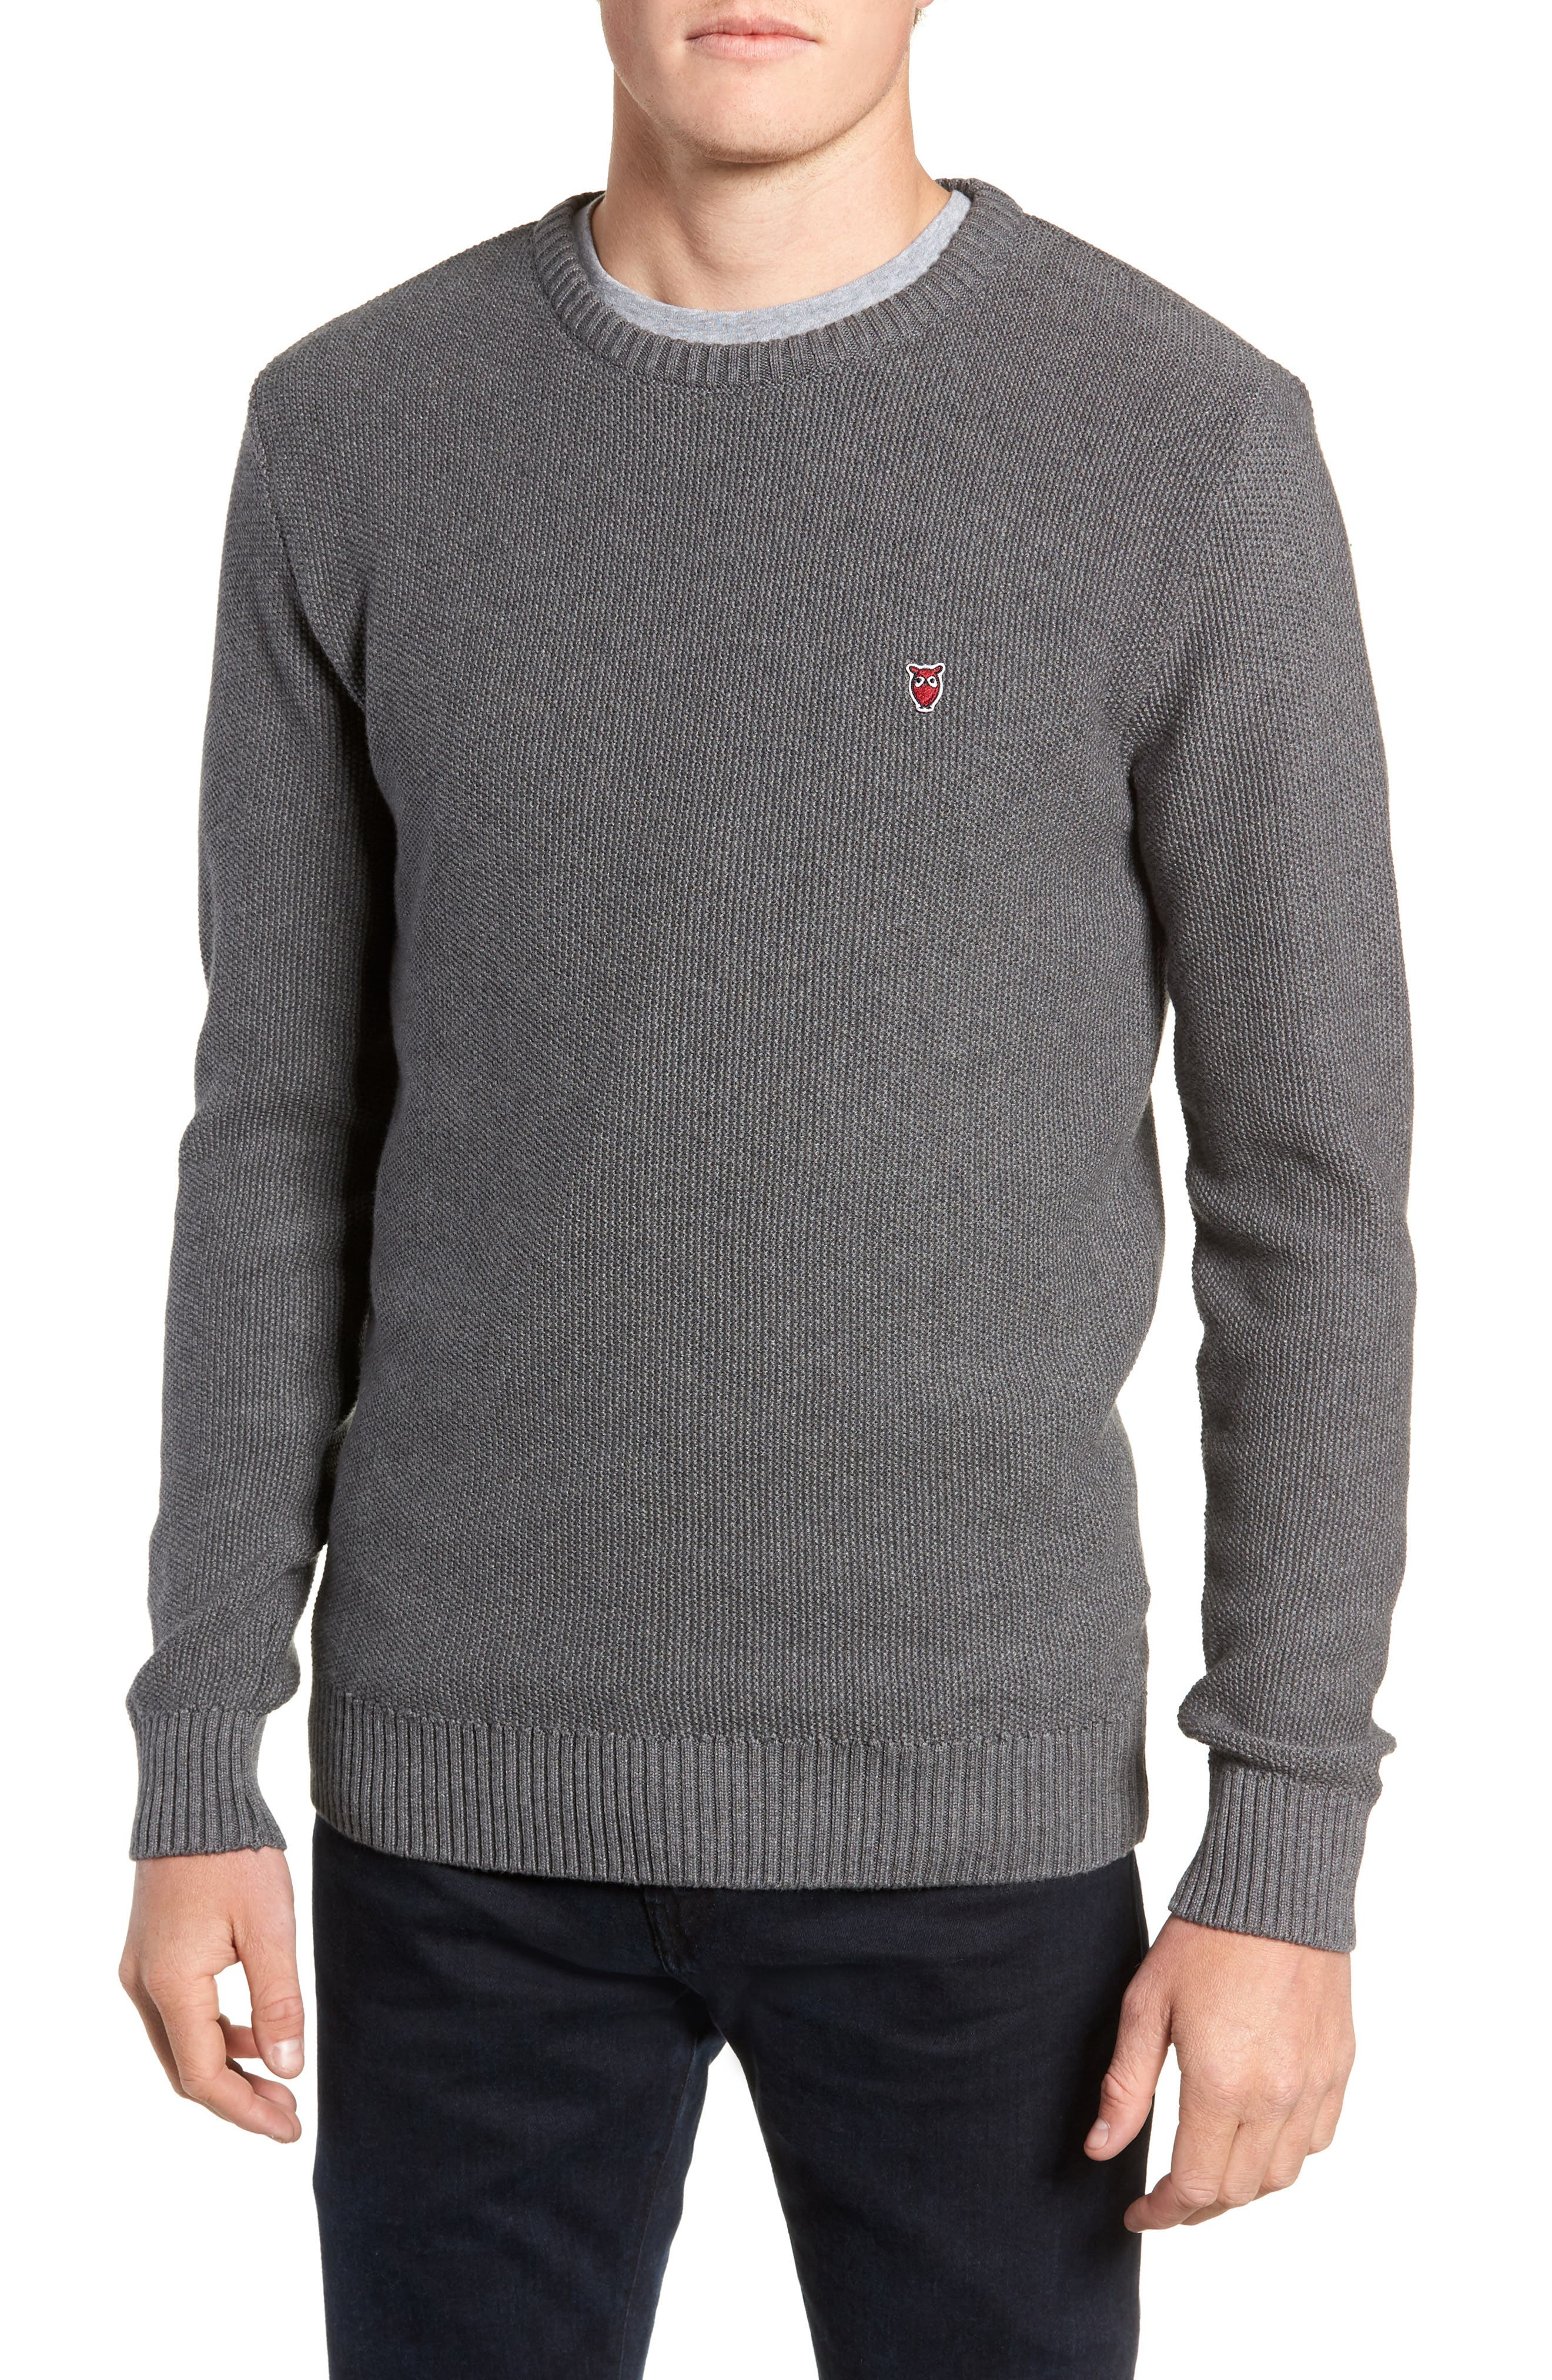 Owl Textured Sweater,                             Main thumbnail 1, color,                             GREY MELANGE